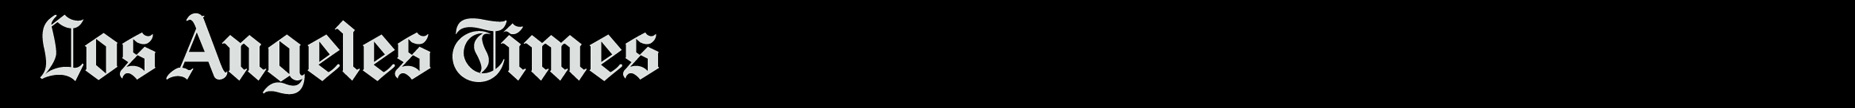 L-A-TIMES_Banner